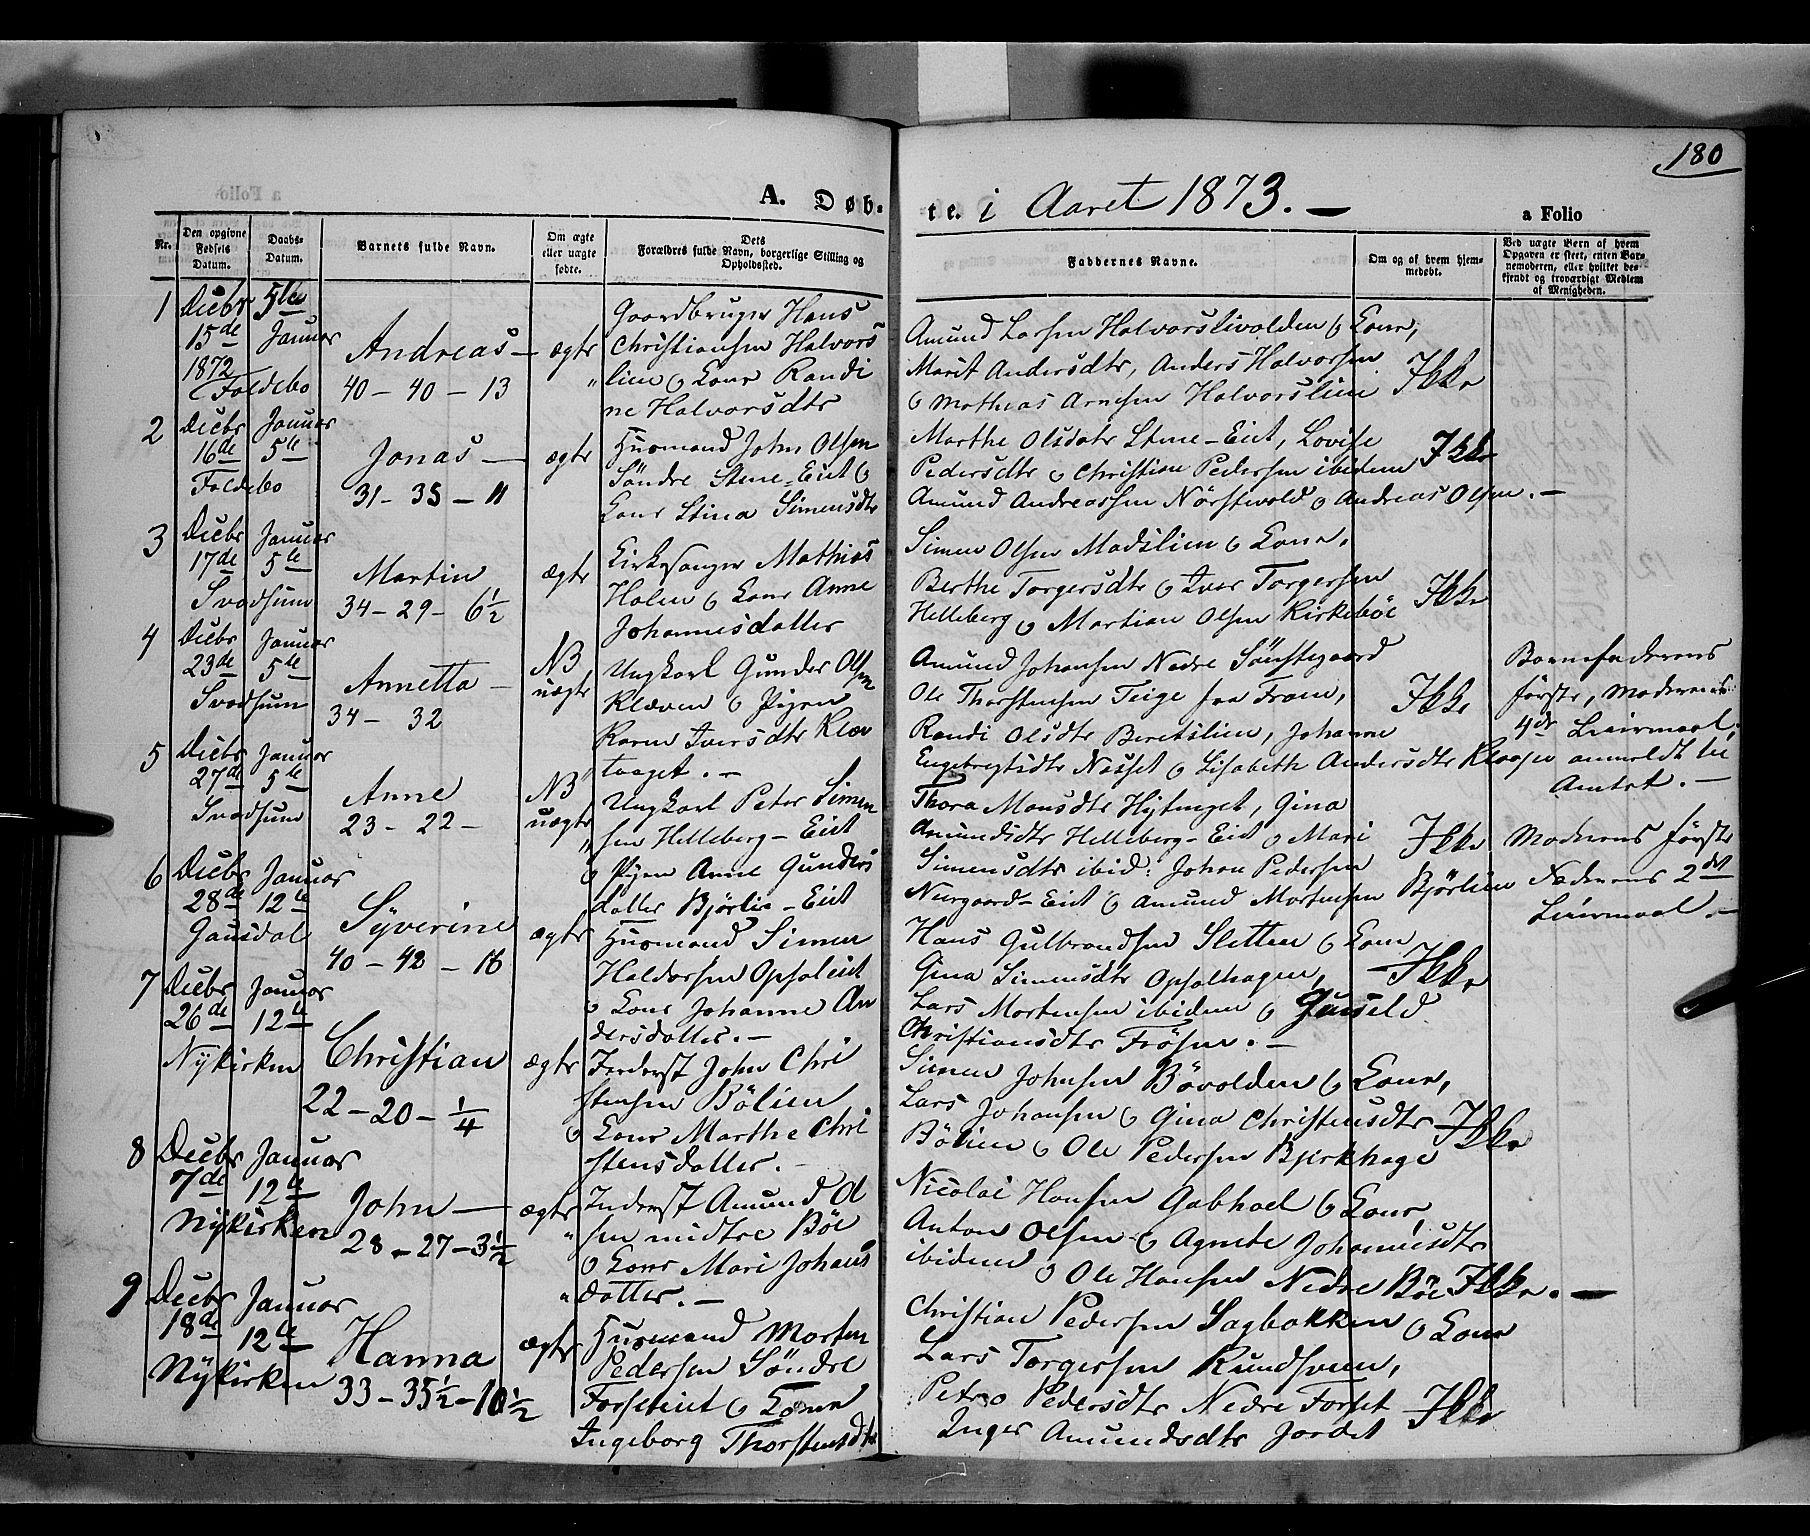 SAH, Gausdal prestekontor, Ministerialbok nr. 9, 1862-1873, s. 180